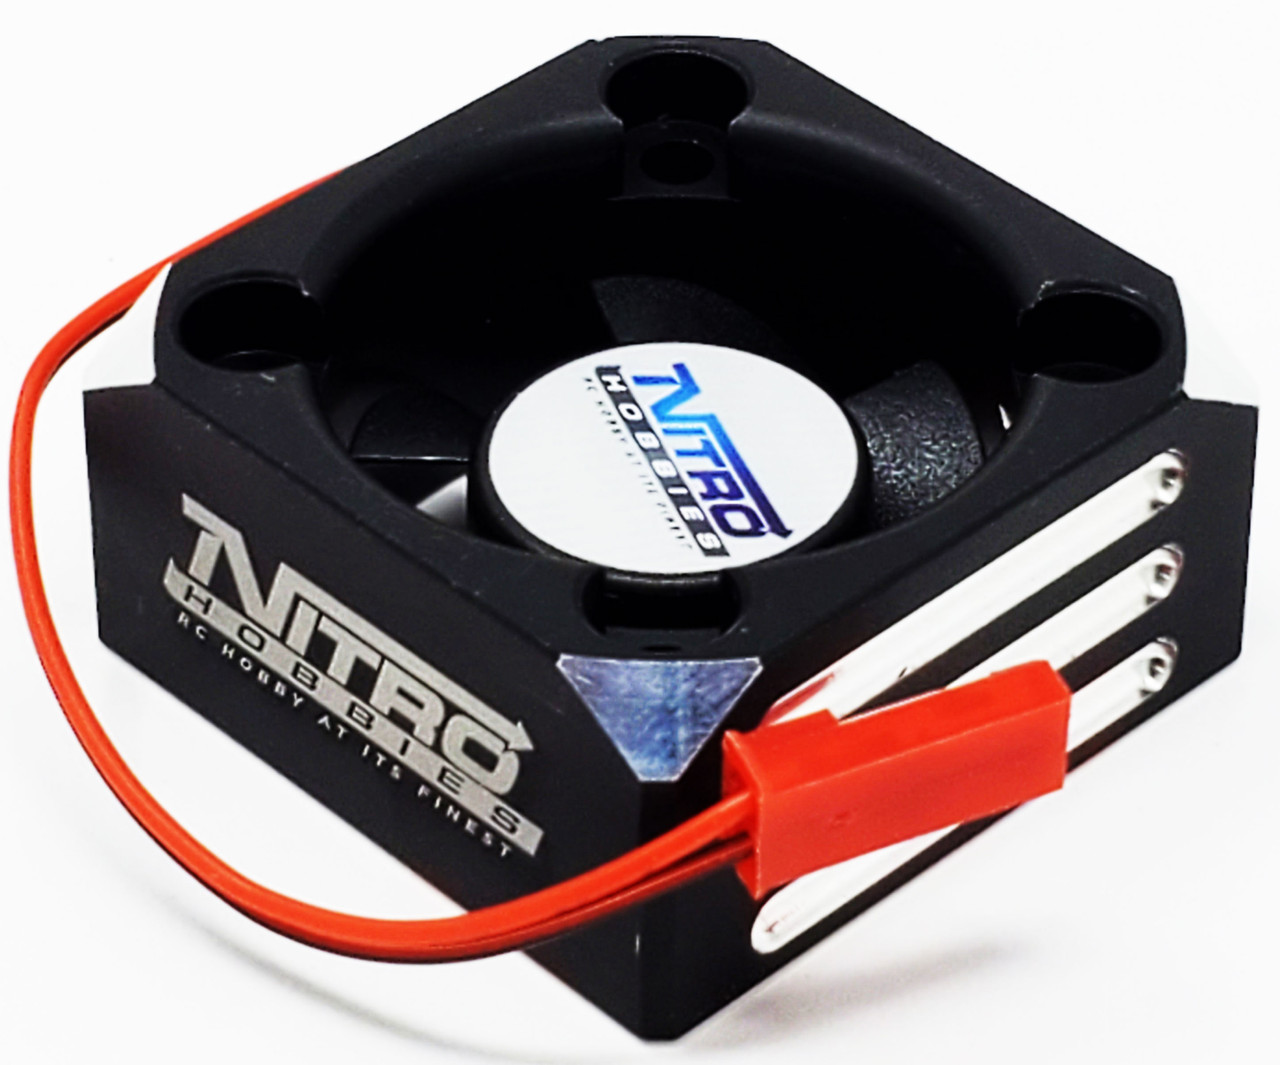 550 Motor Turbo Cooling Fan Red Arrma Senton 4X4 Nitro Hobbies Alum Case 540